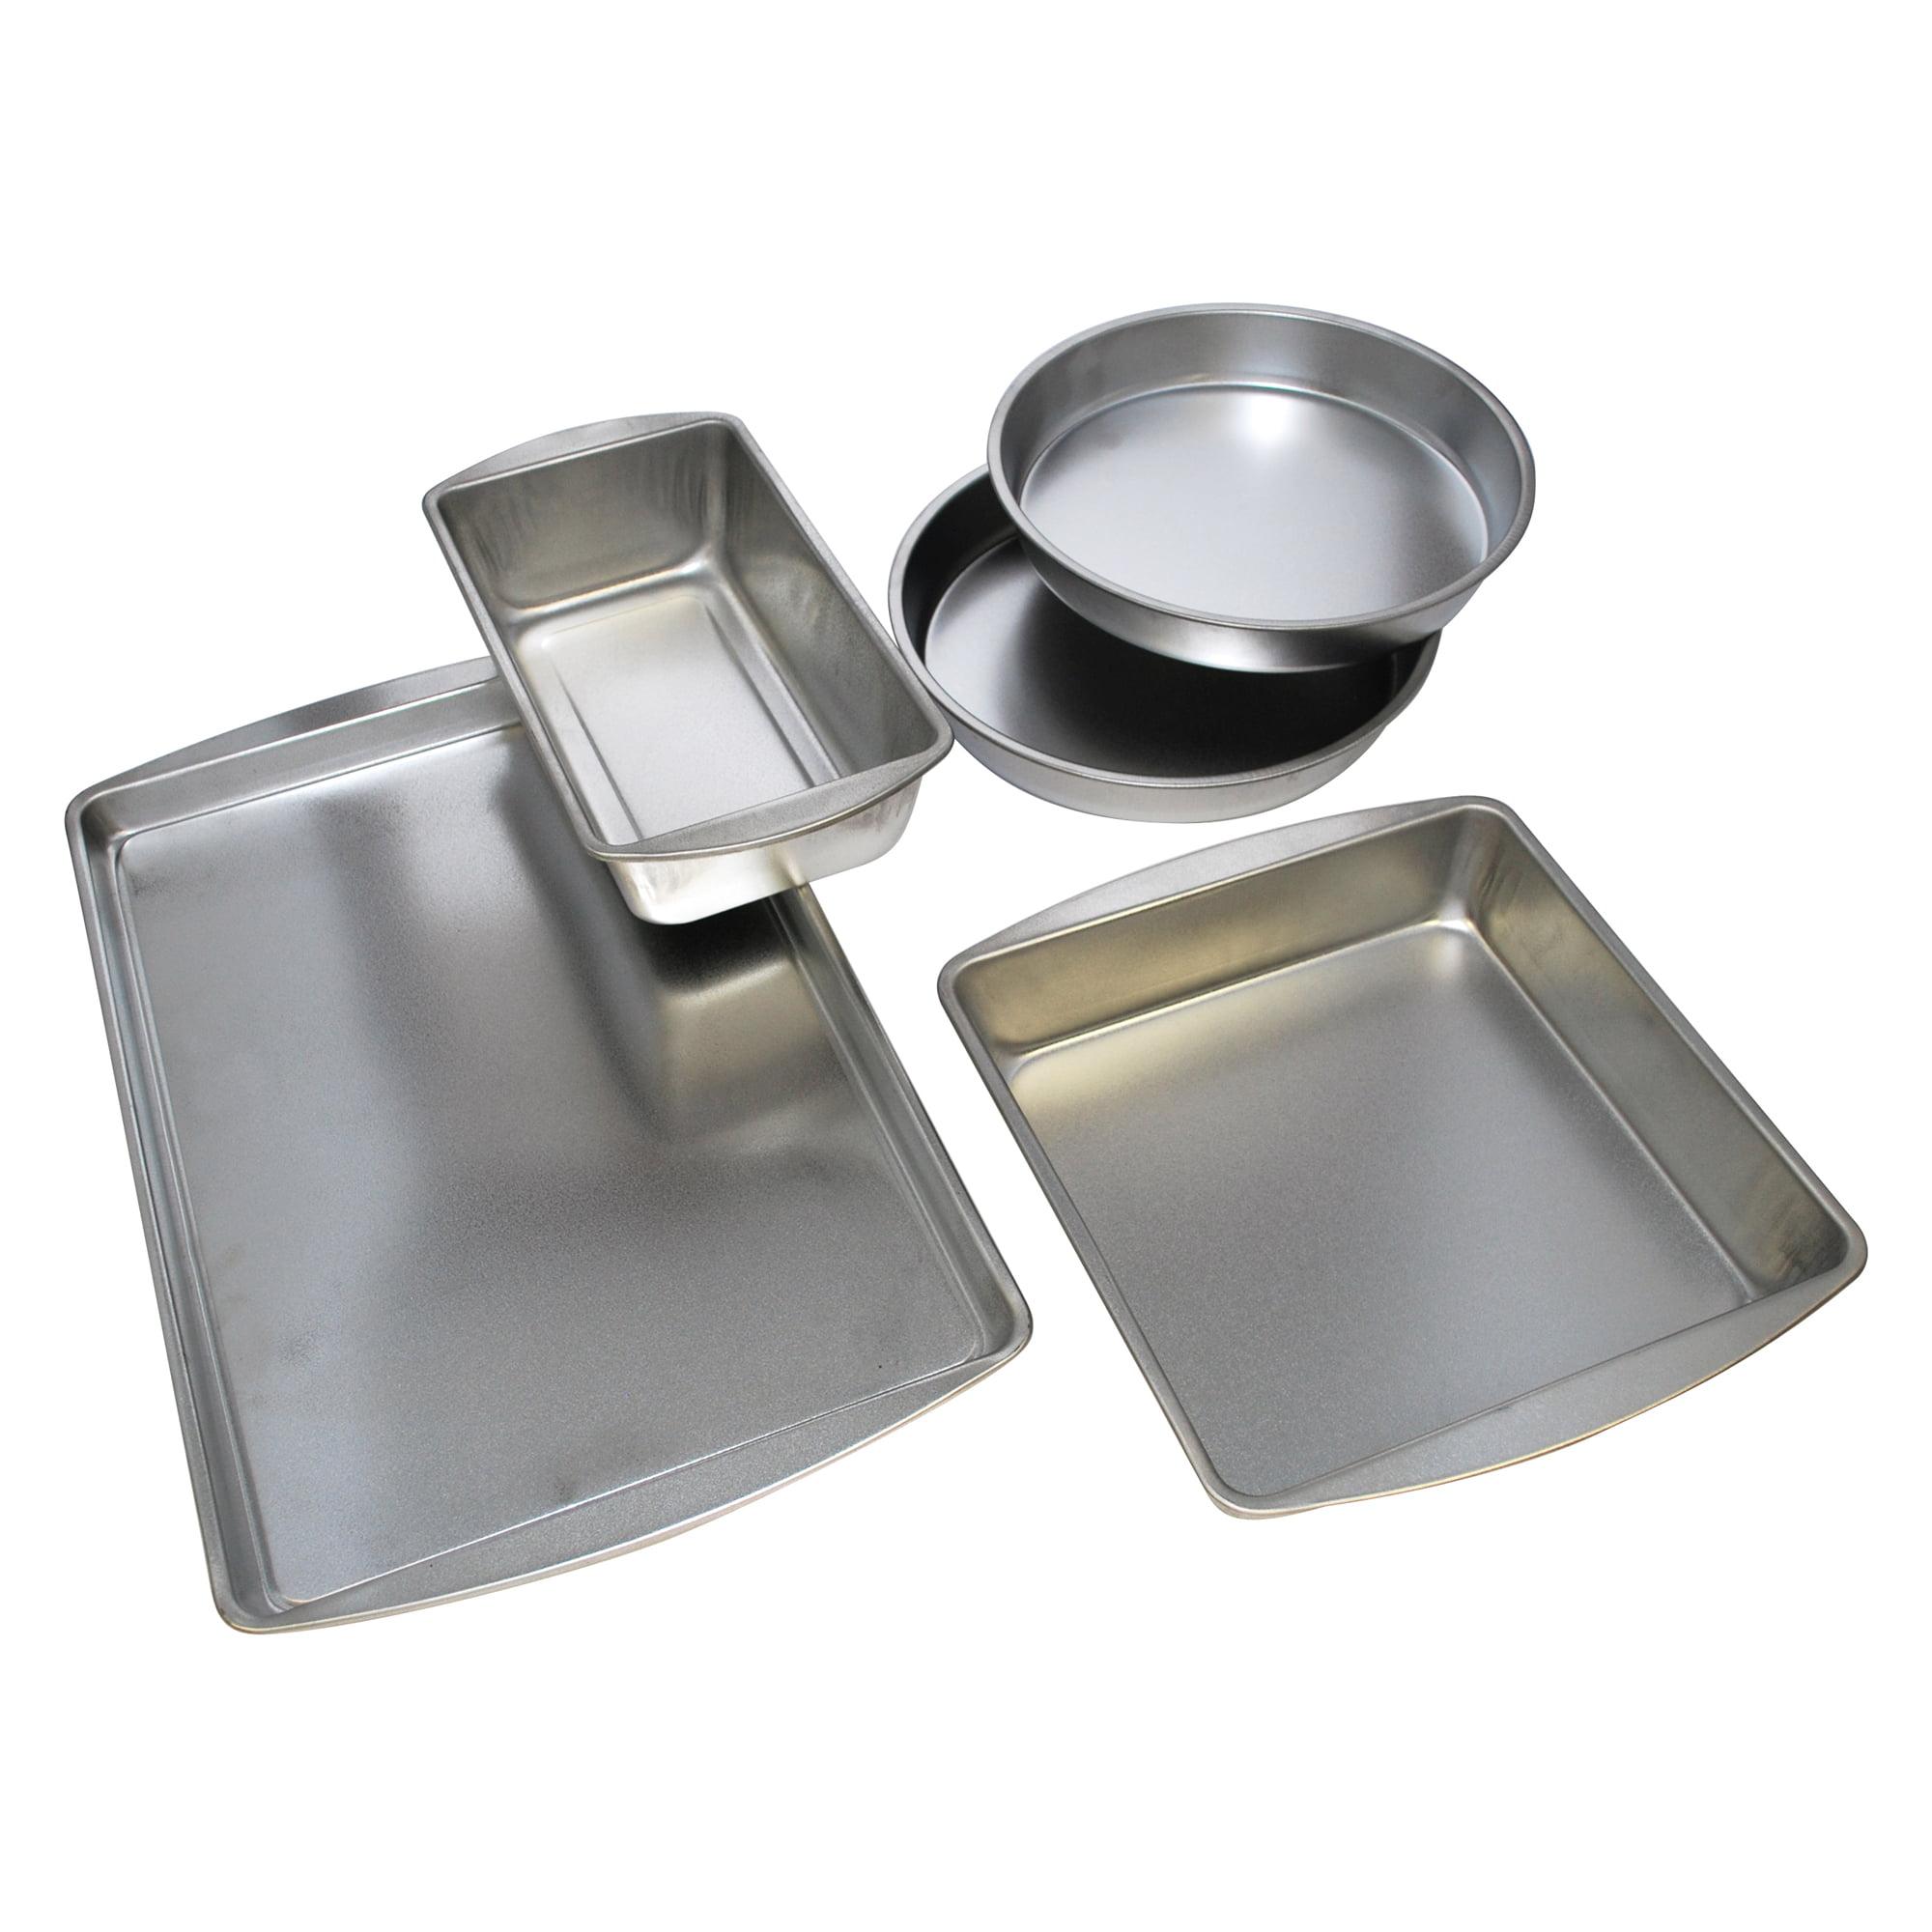 Mainstays 5pc Bakeware Set